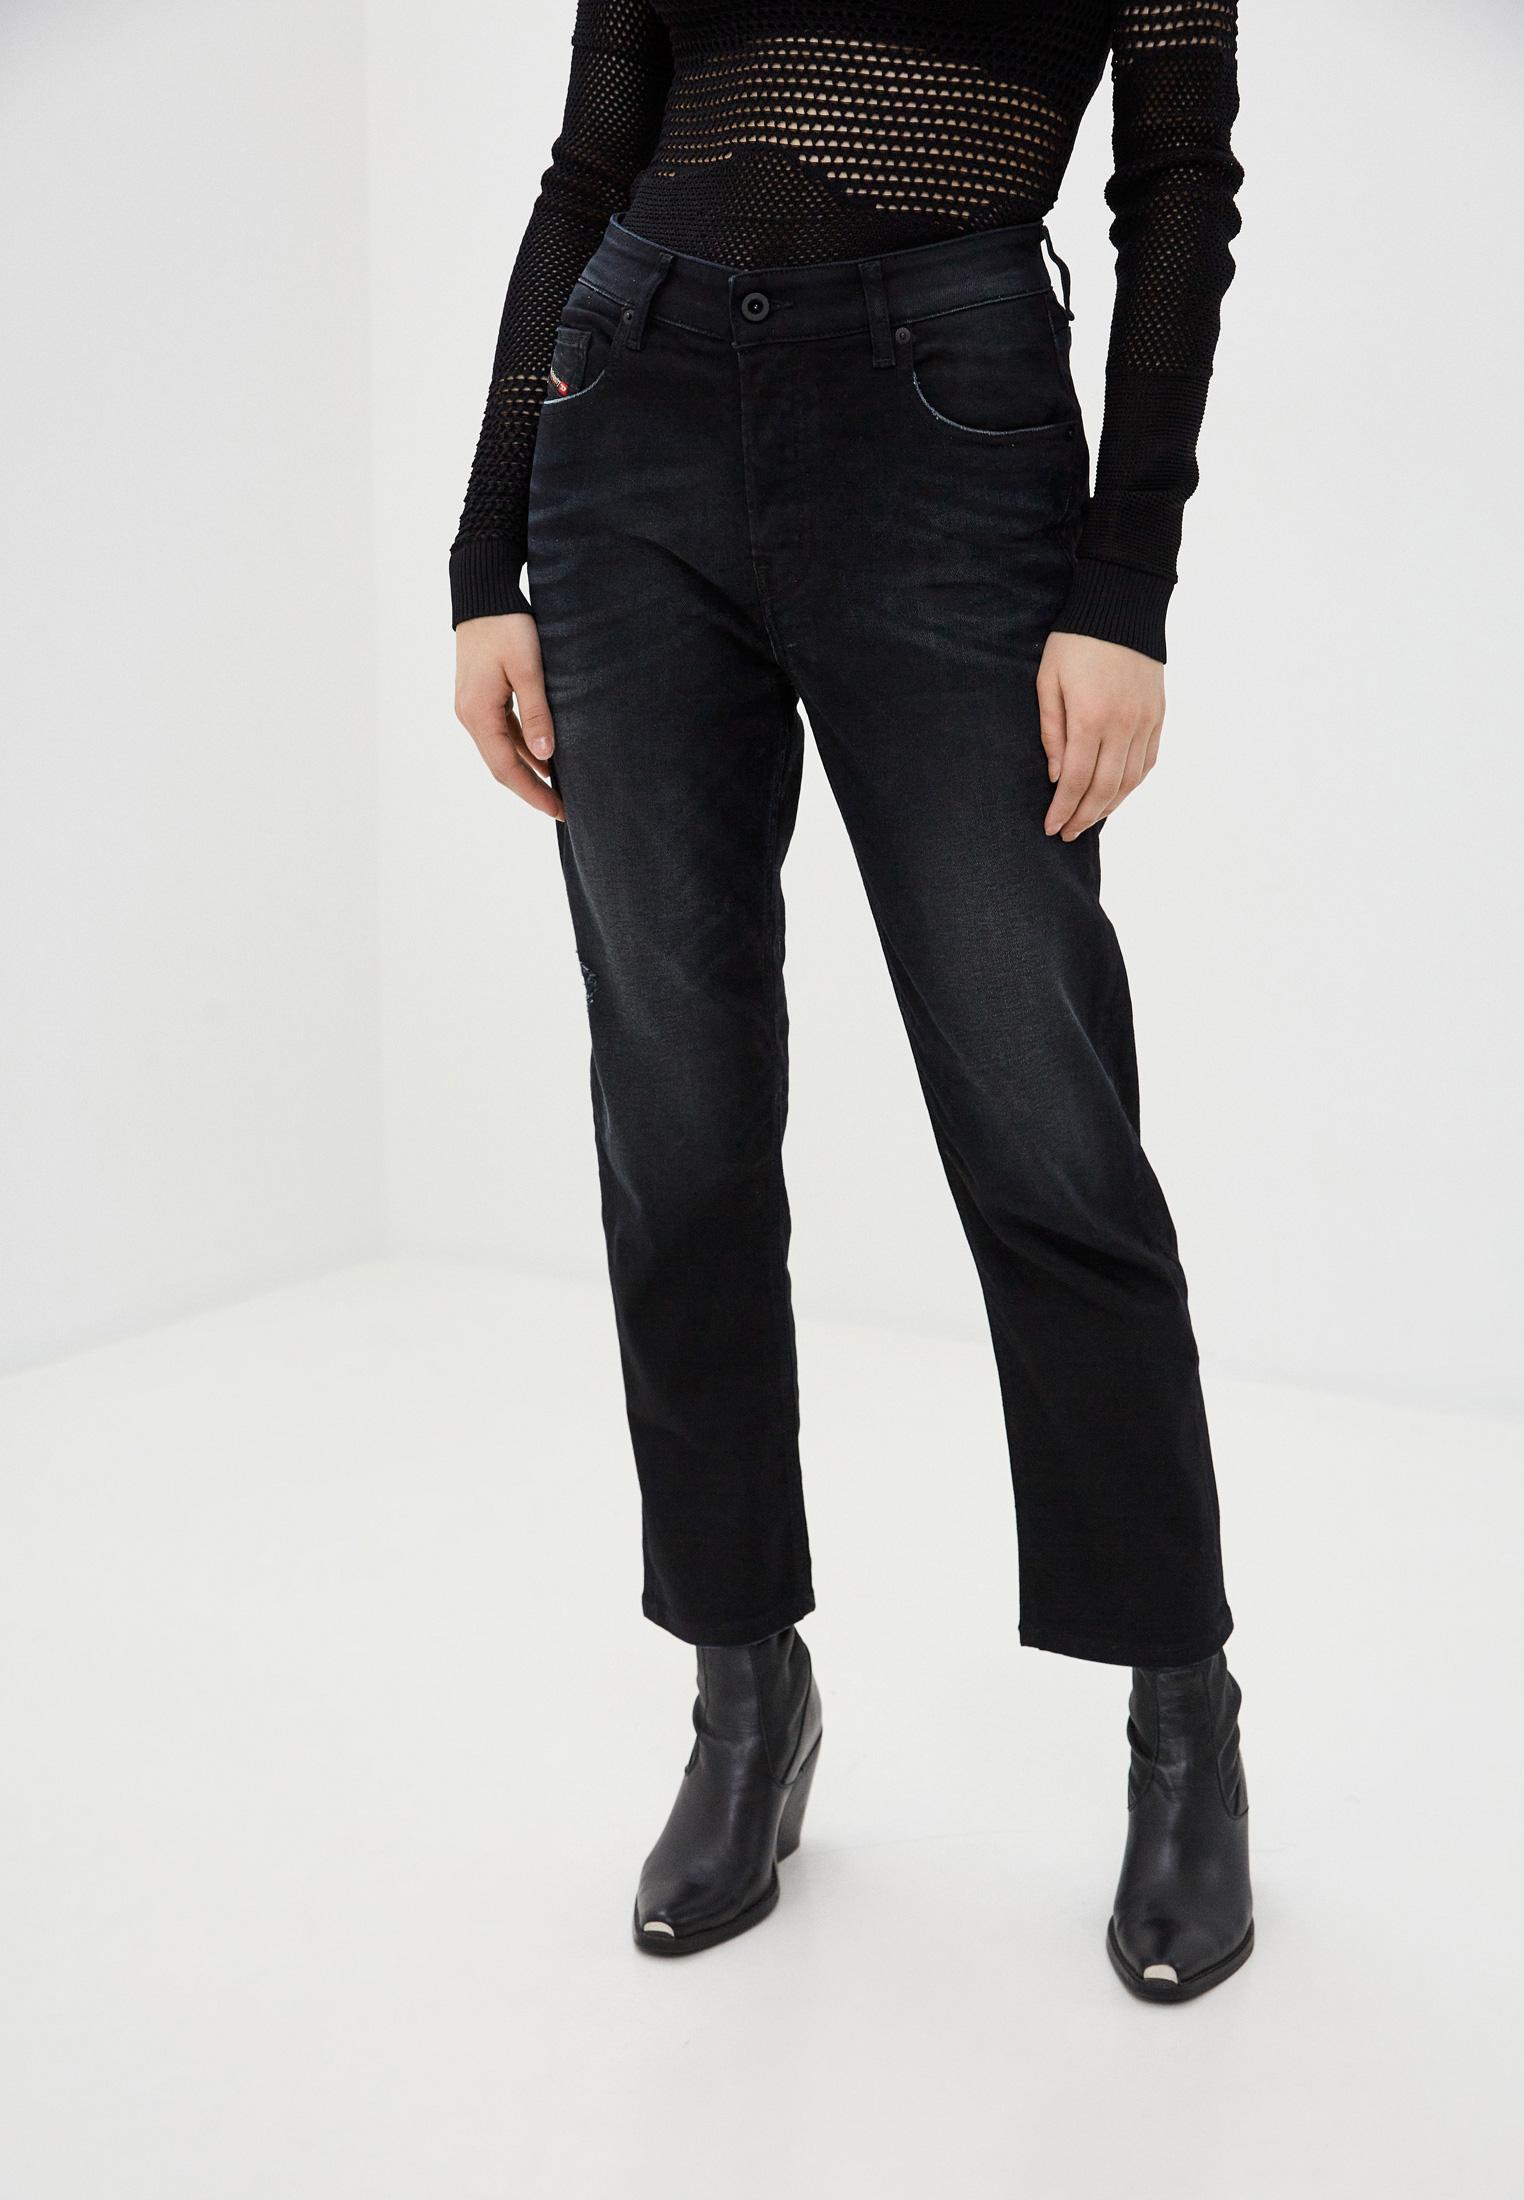 Прямые джинсы Diesel (Дизель) 00SHG70679R